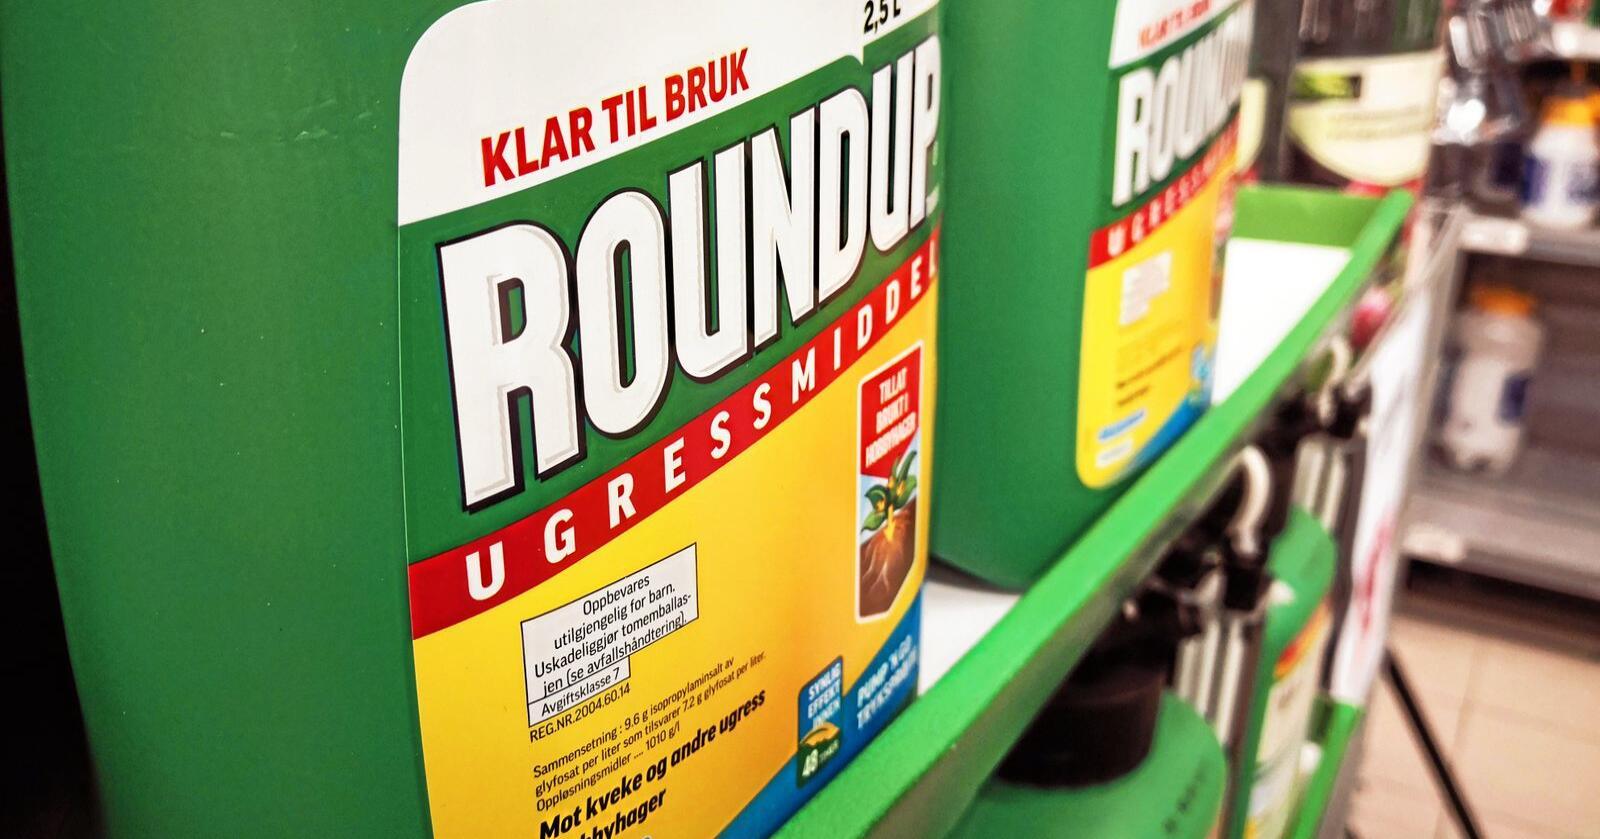 Glyfosat finnes i blant annet ugressmiddelet Roundup. Foto: Jon-Fredrik Bækgaard Klausen